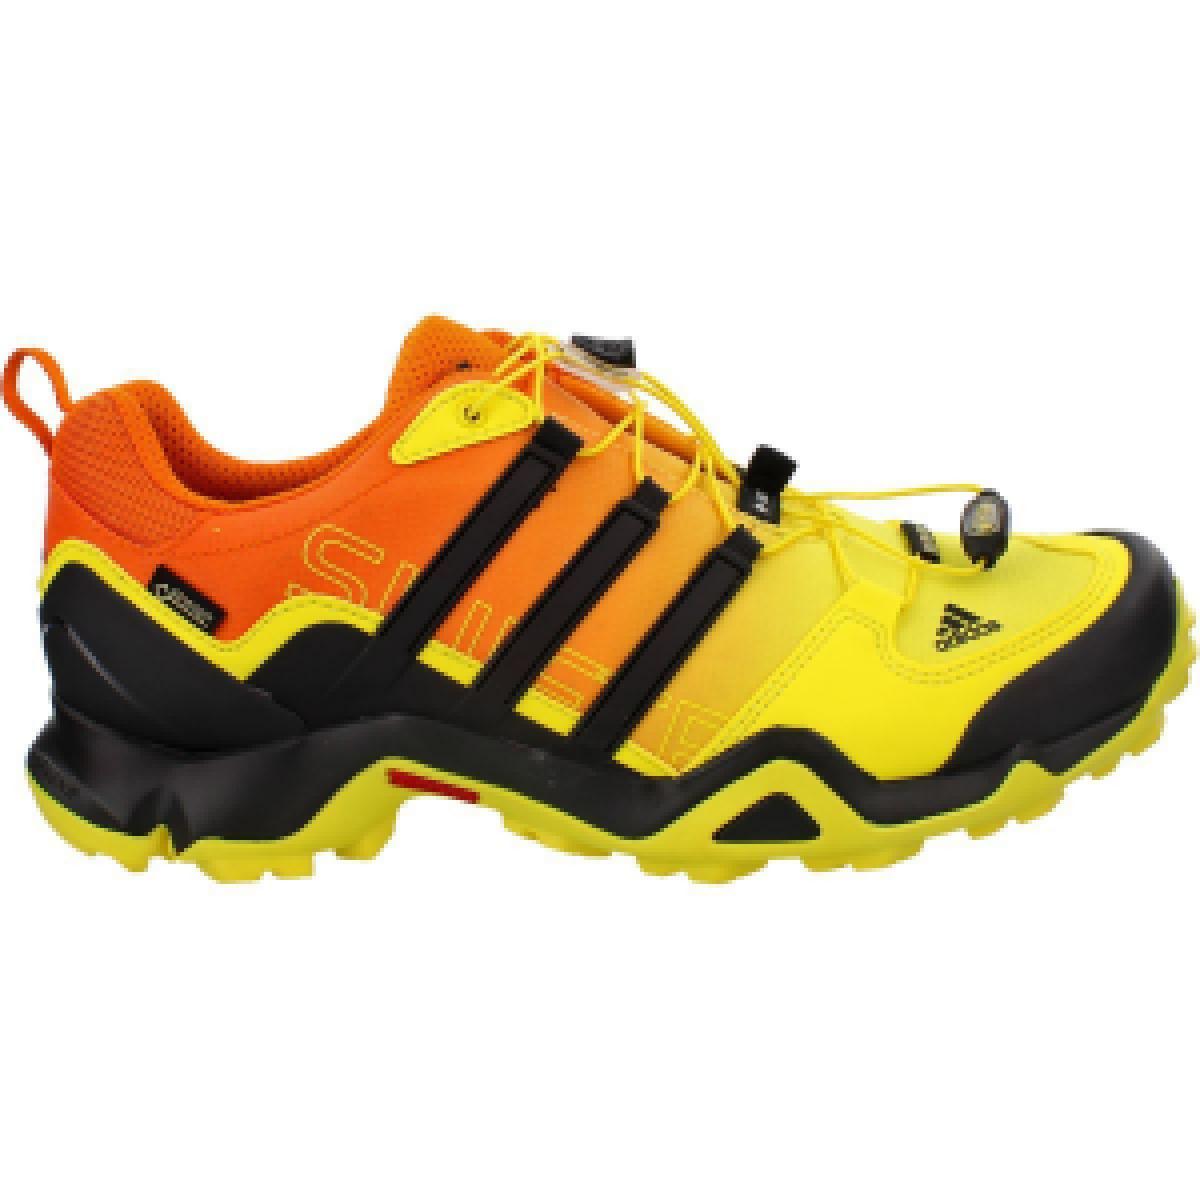 5dd0e645ee5 Adidas Outdoor Terrex Swift R GTX Hiking Shoe - Men's